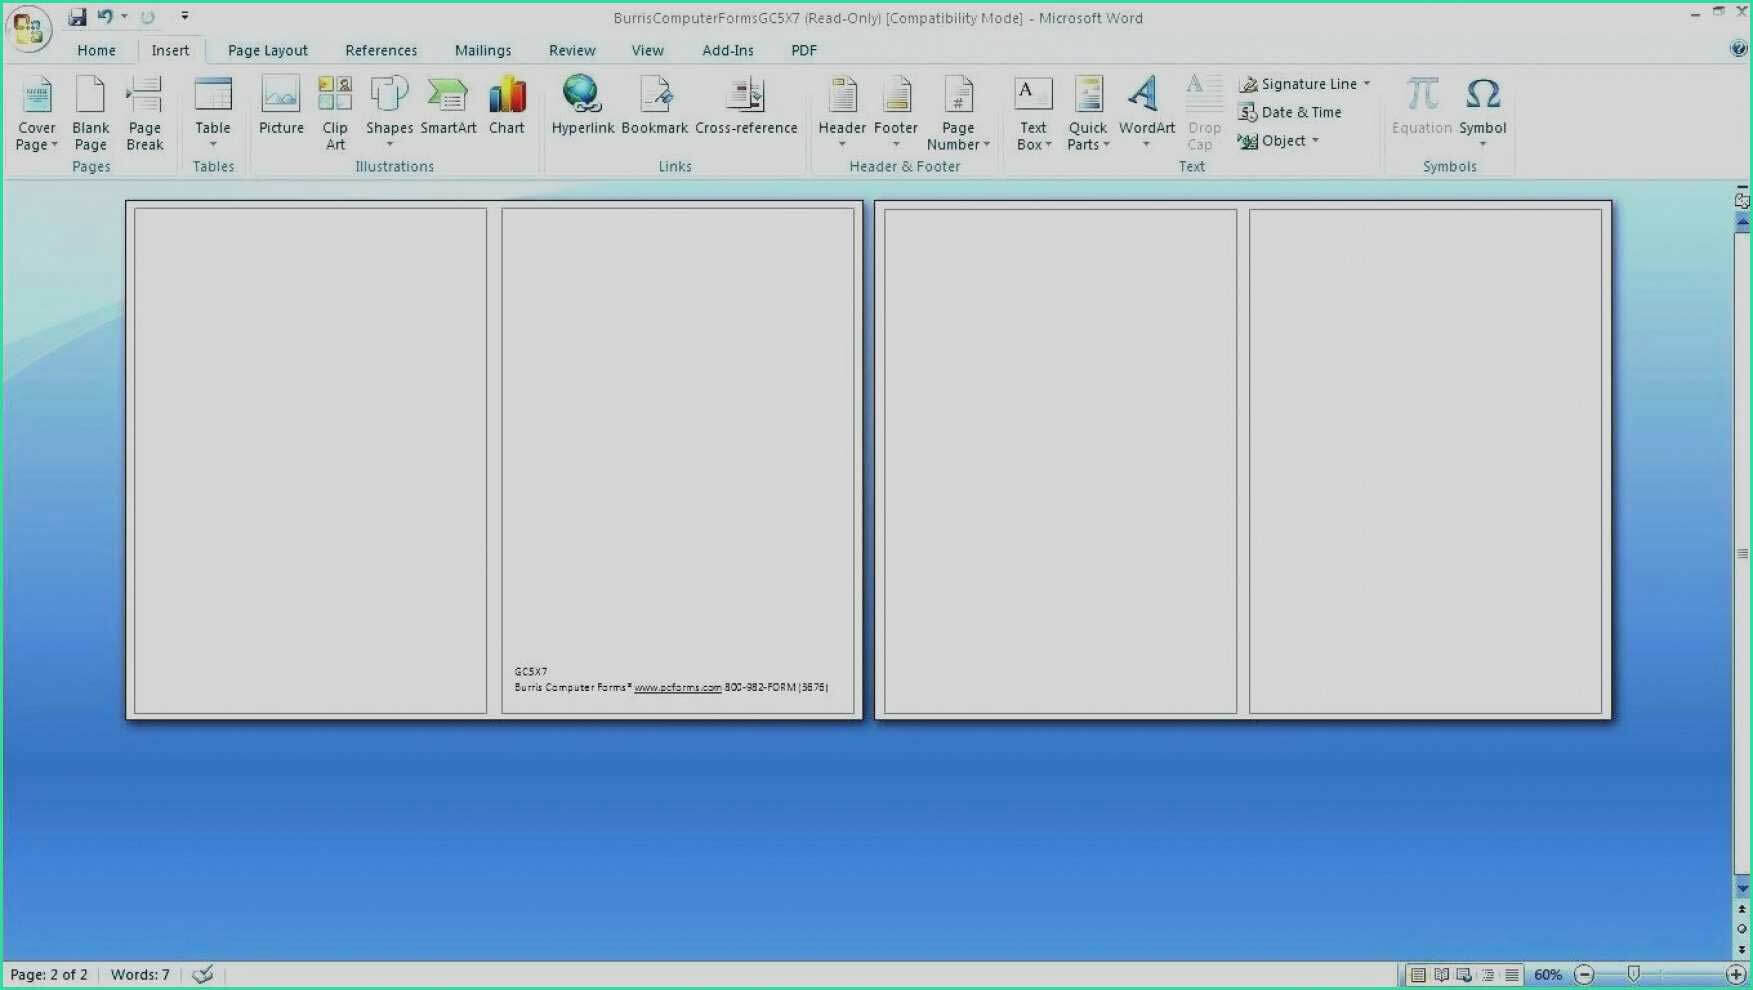 001 Template Ideas Blank Quarter Fold Card Microsoft Word With Blank Quarter Fold Card Template